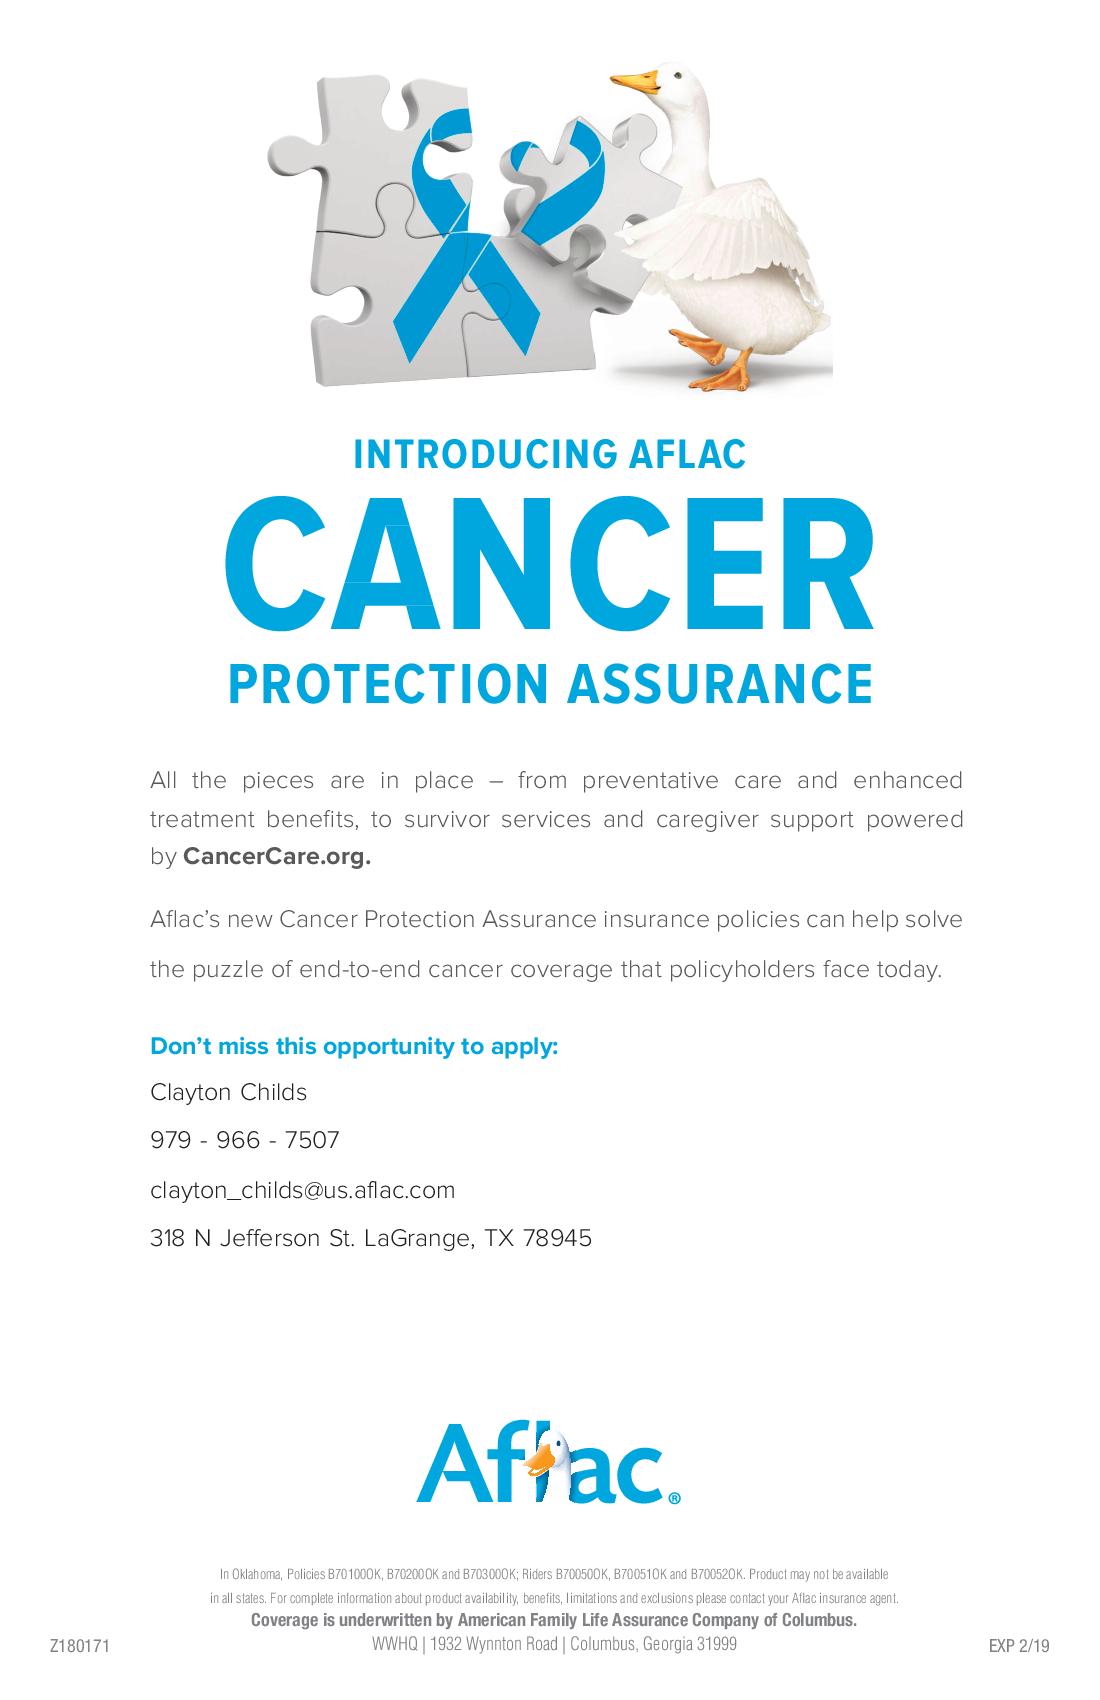 Aflac Insurance Agent In La Grange Tx Insurance Companies